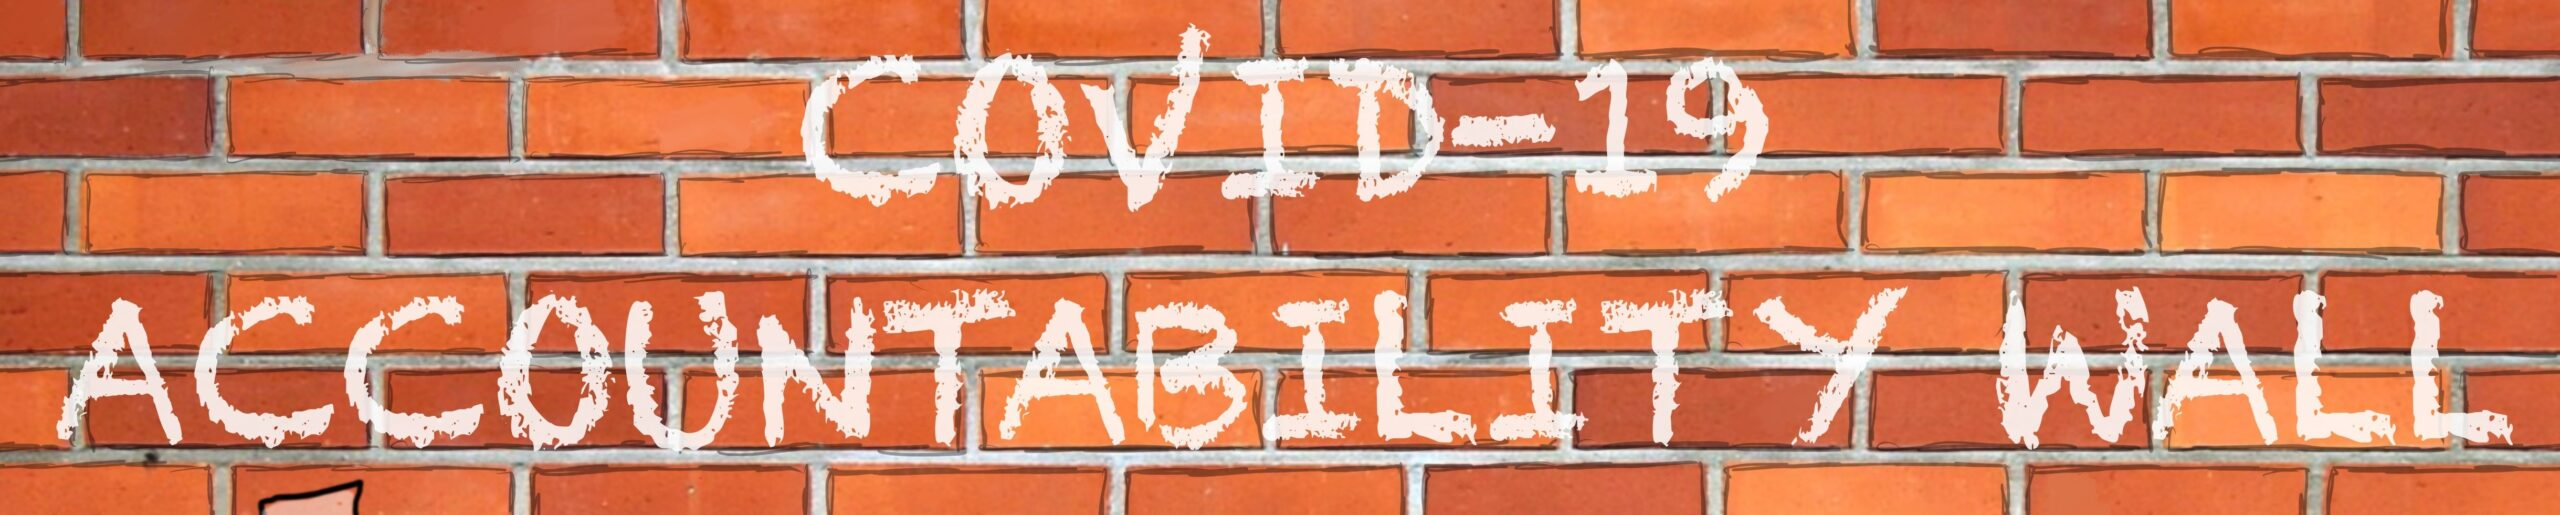 "Image reading ""COVID-19 Accountability Wall."""